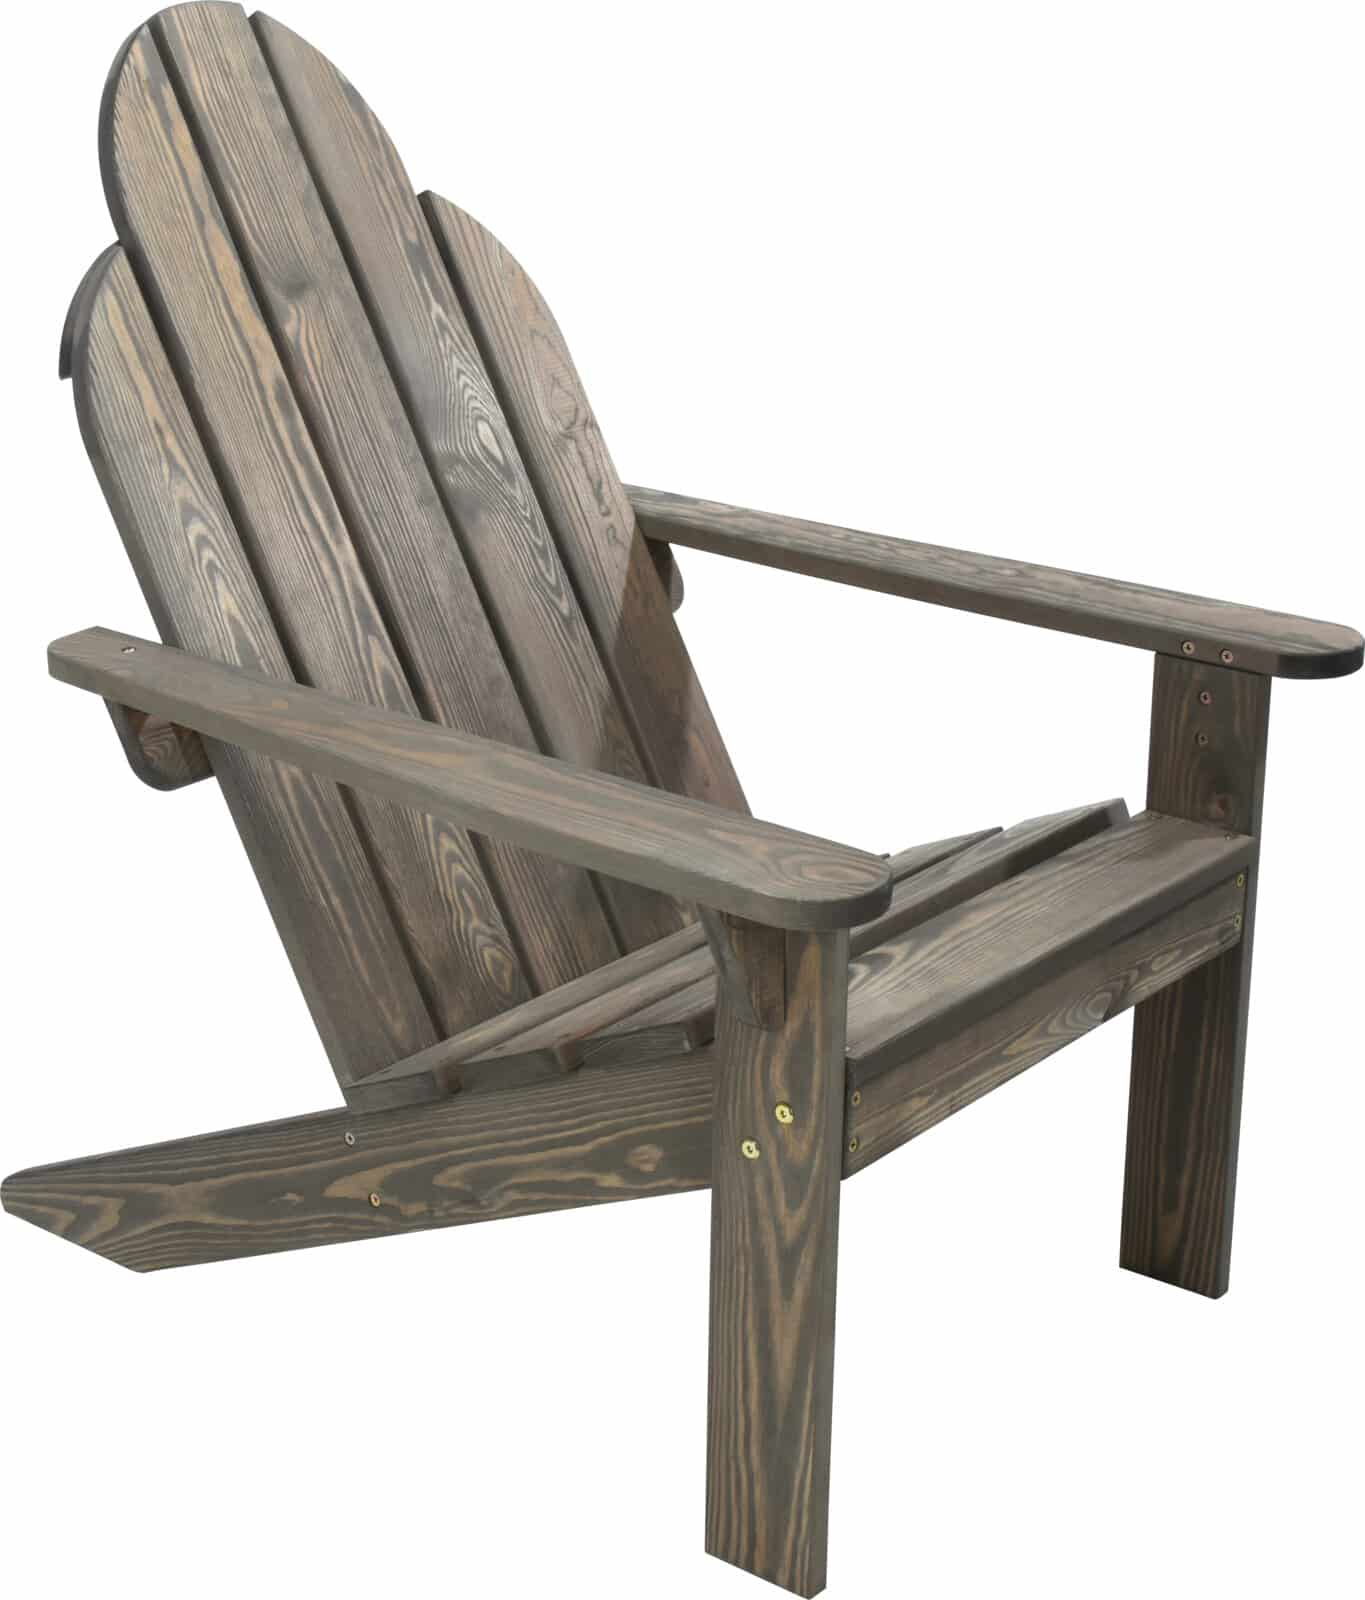 4goodz comfortabele Deckchair Tuinstoel - Bruin